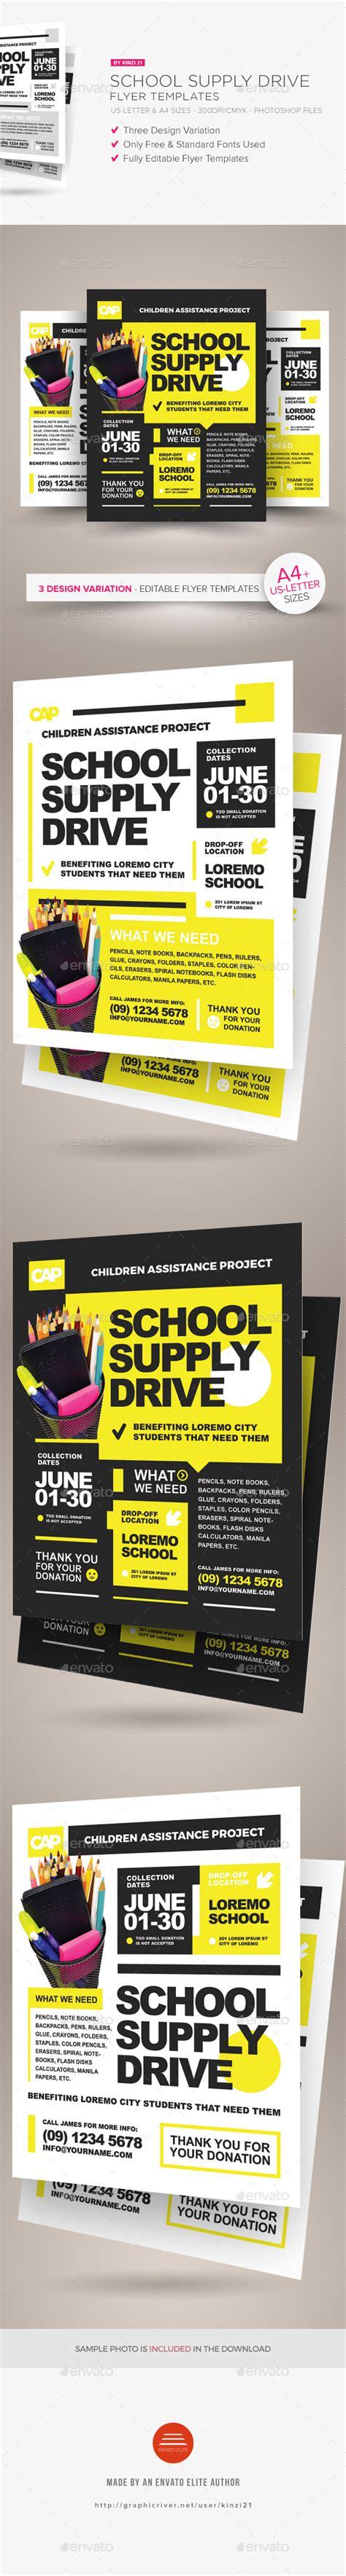 school supplies flyer template design school supply drive flyer templates by kinzi21 graphicriver